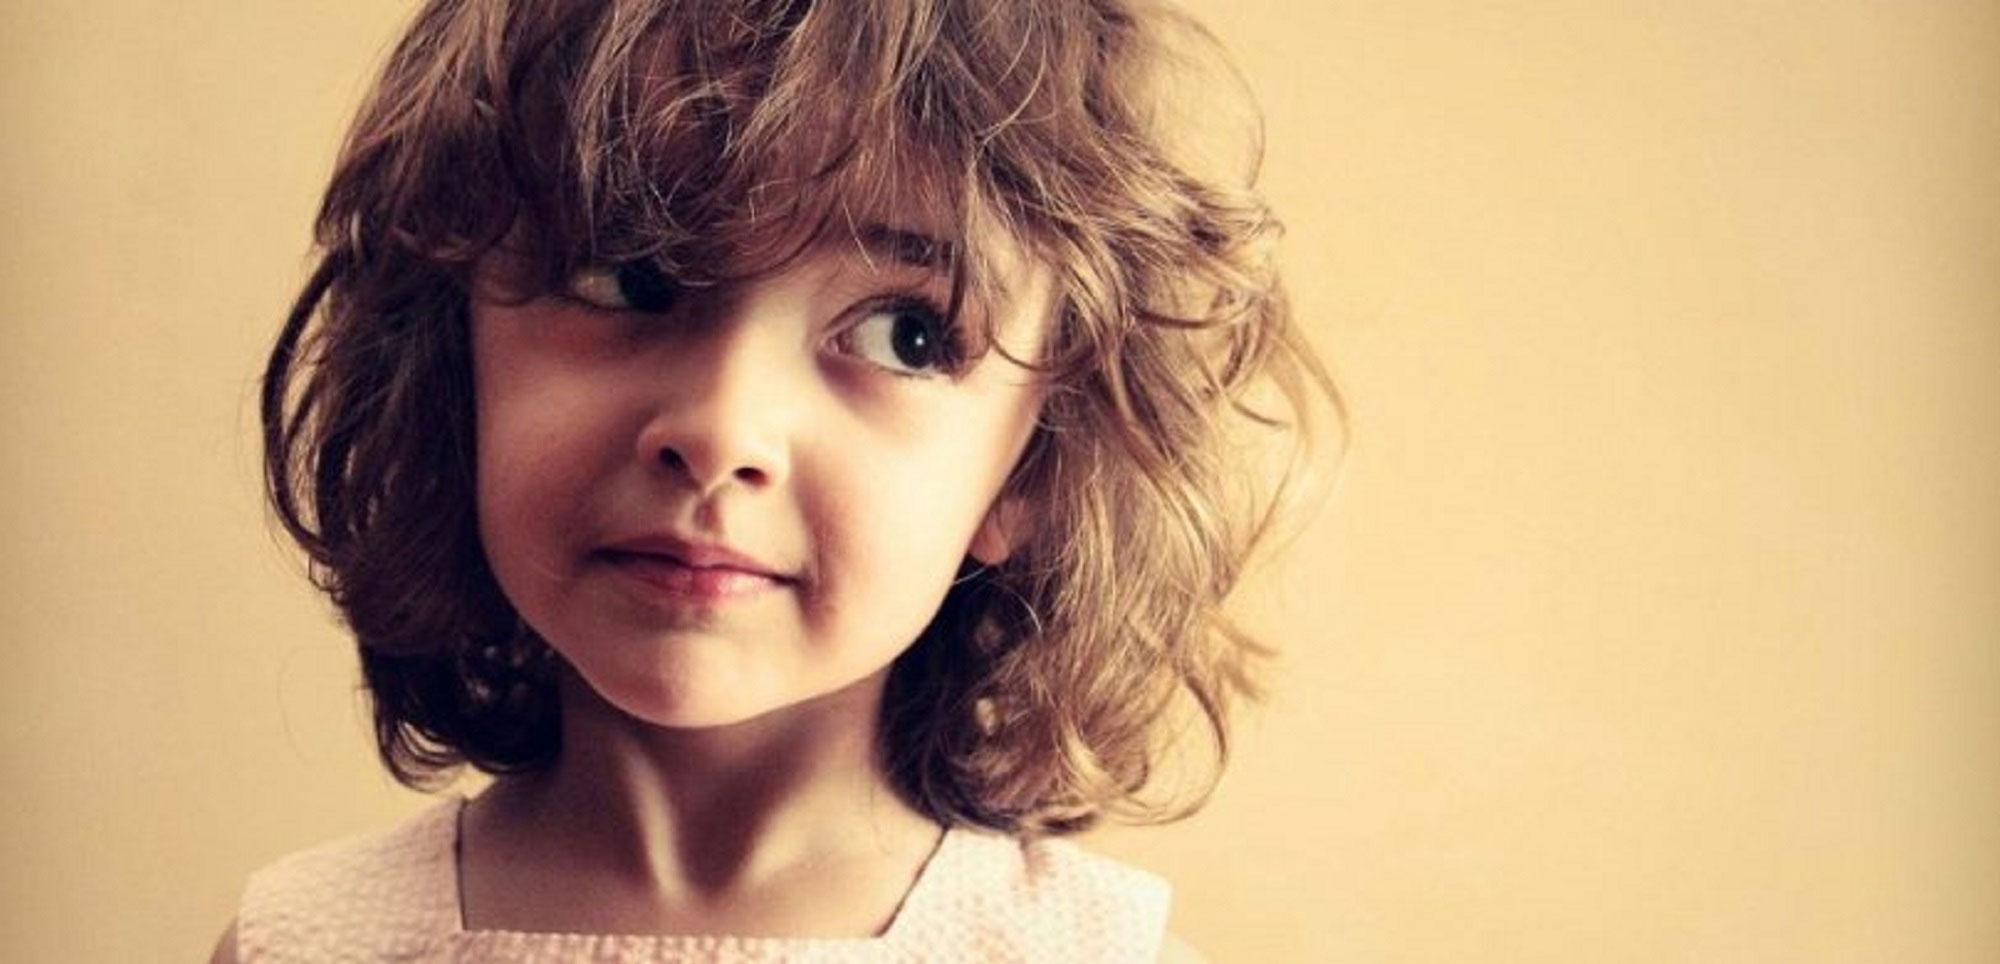 child-adolescent-parenting-issues-1024x683-830x390-1